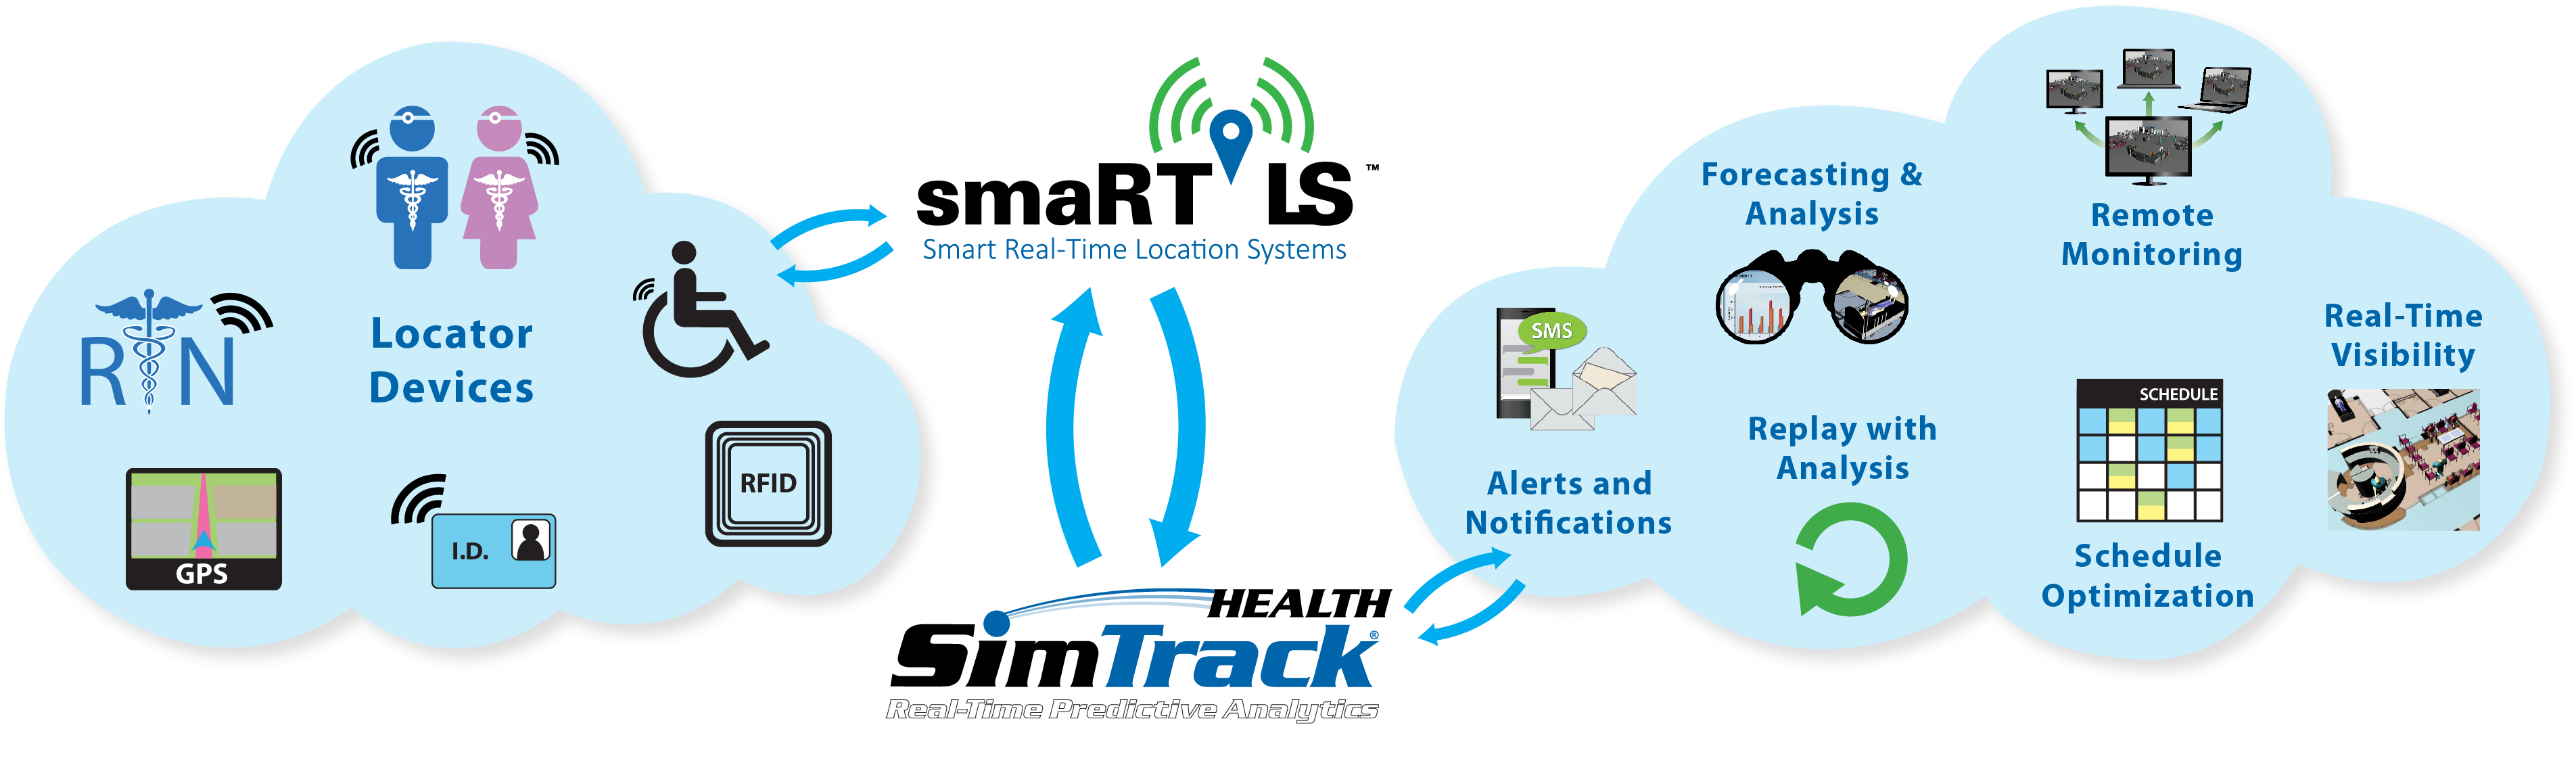 Healthcare Predictive Analytics Software, Healthcare